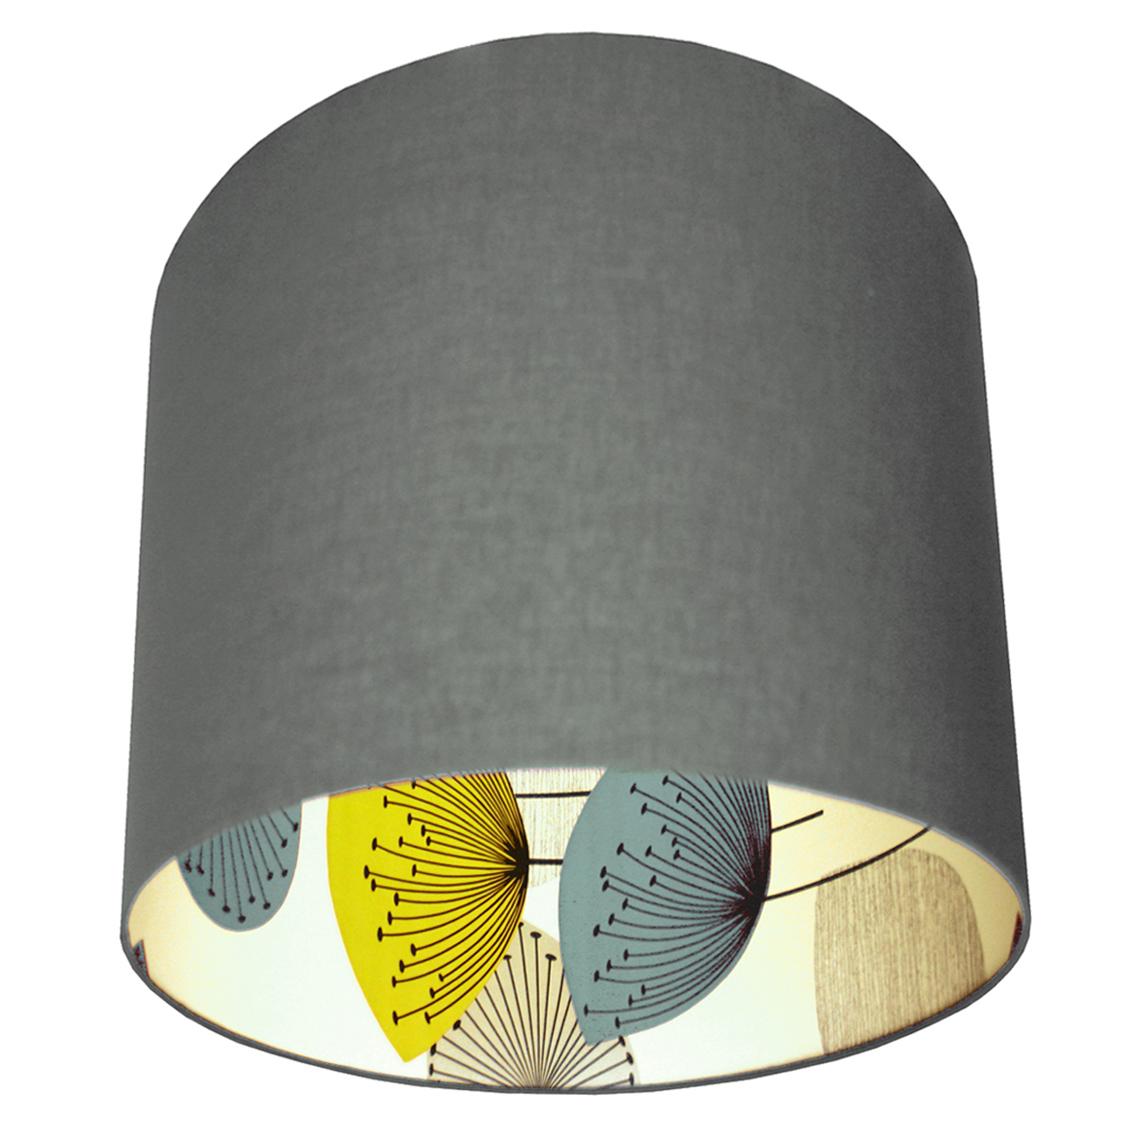 Sansderson Dandelion Clocks Wallpaper Lampshade In Grey